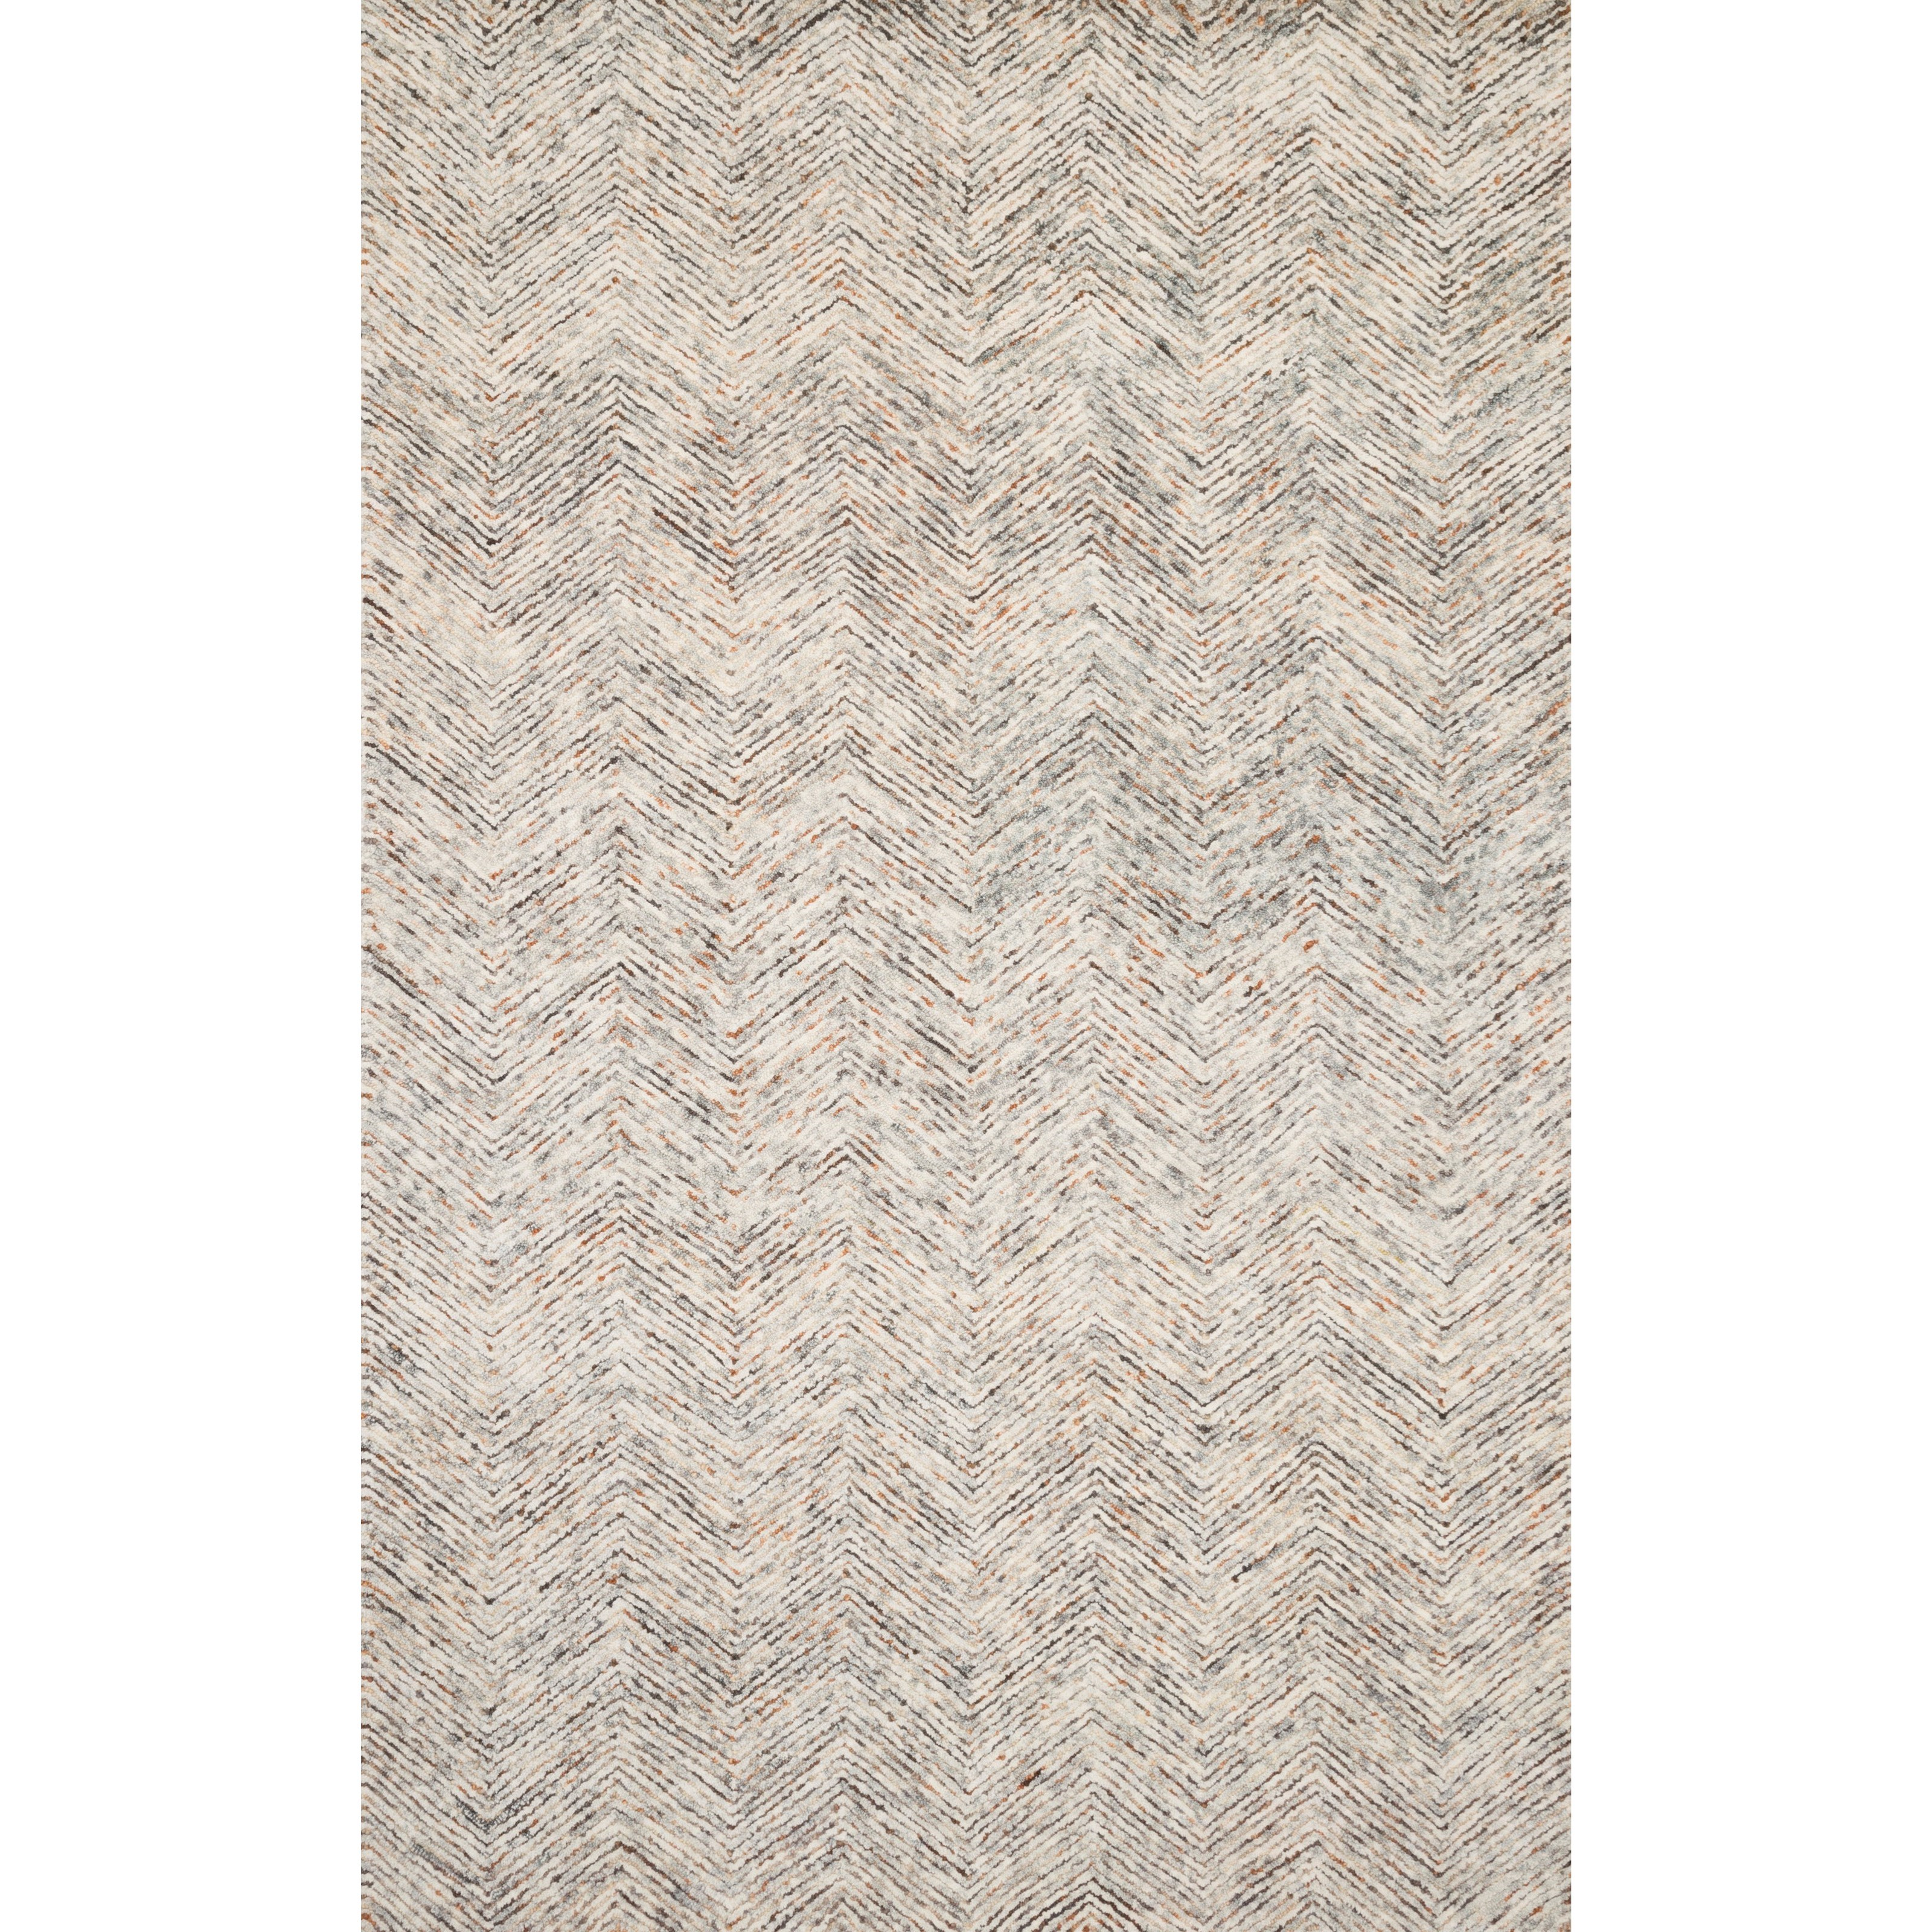 "Peregrine 11'6"" x 15' Lt Grey / Multi Rug by Loloi Rugs at Virginia Furniture Market"